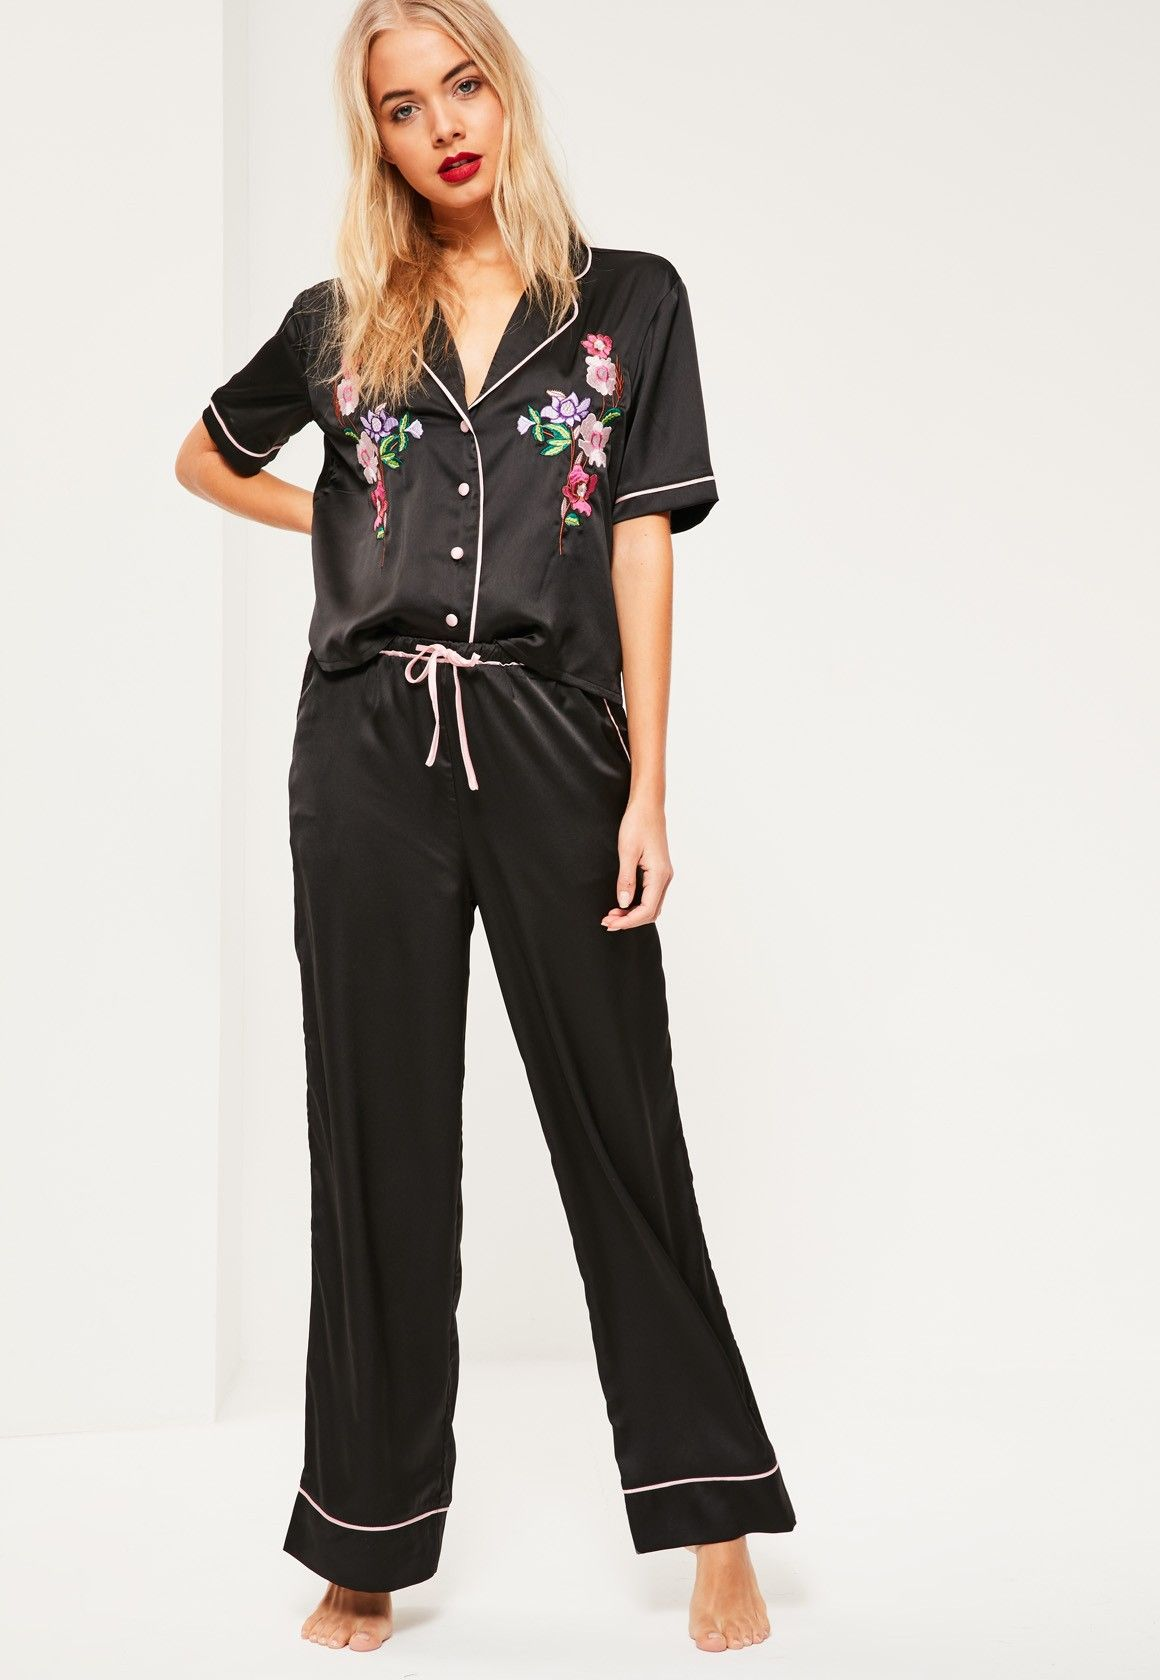 ... women s sleepwear. Missguided - Black Luxury Satin Embroidered Pyjama  Set 2071bde09